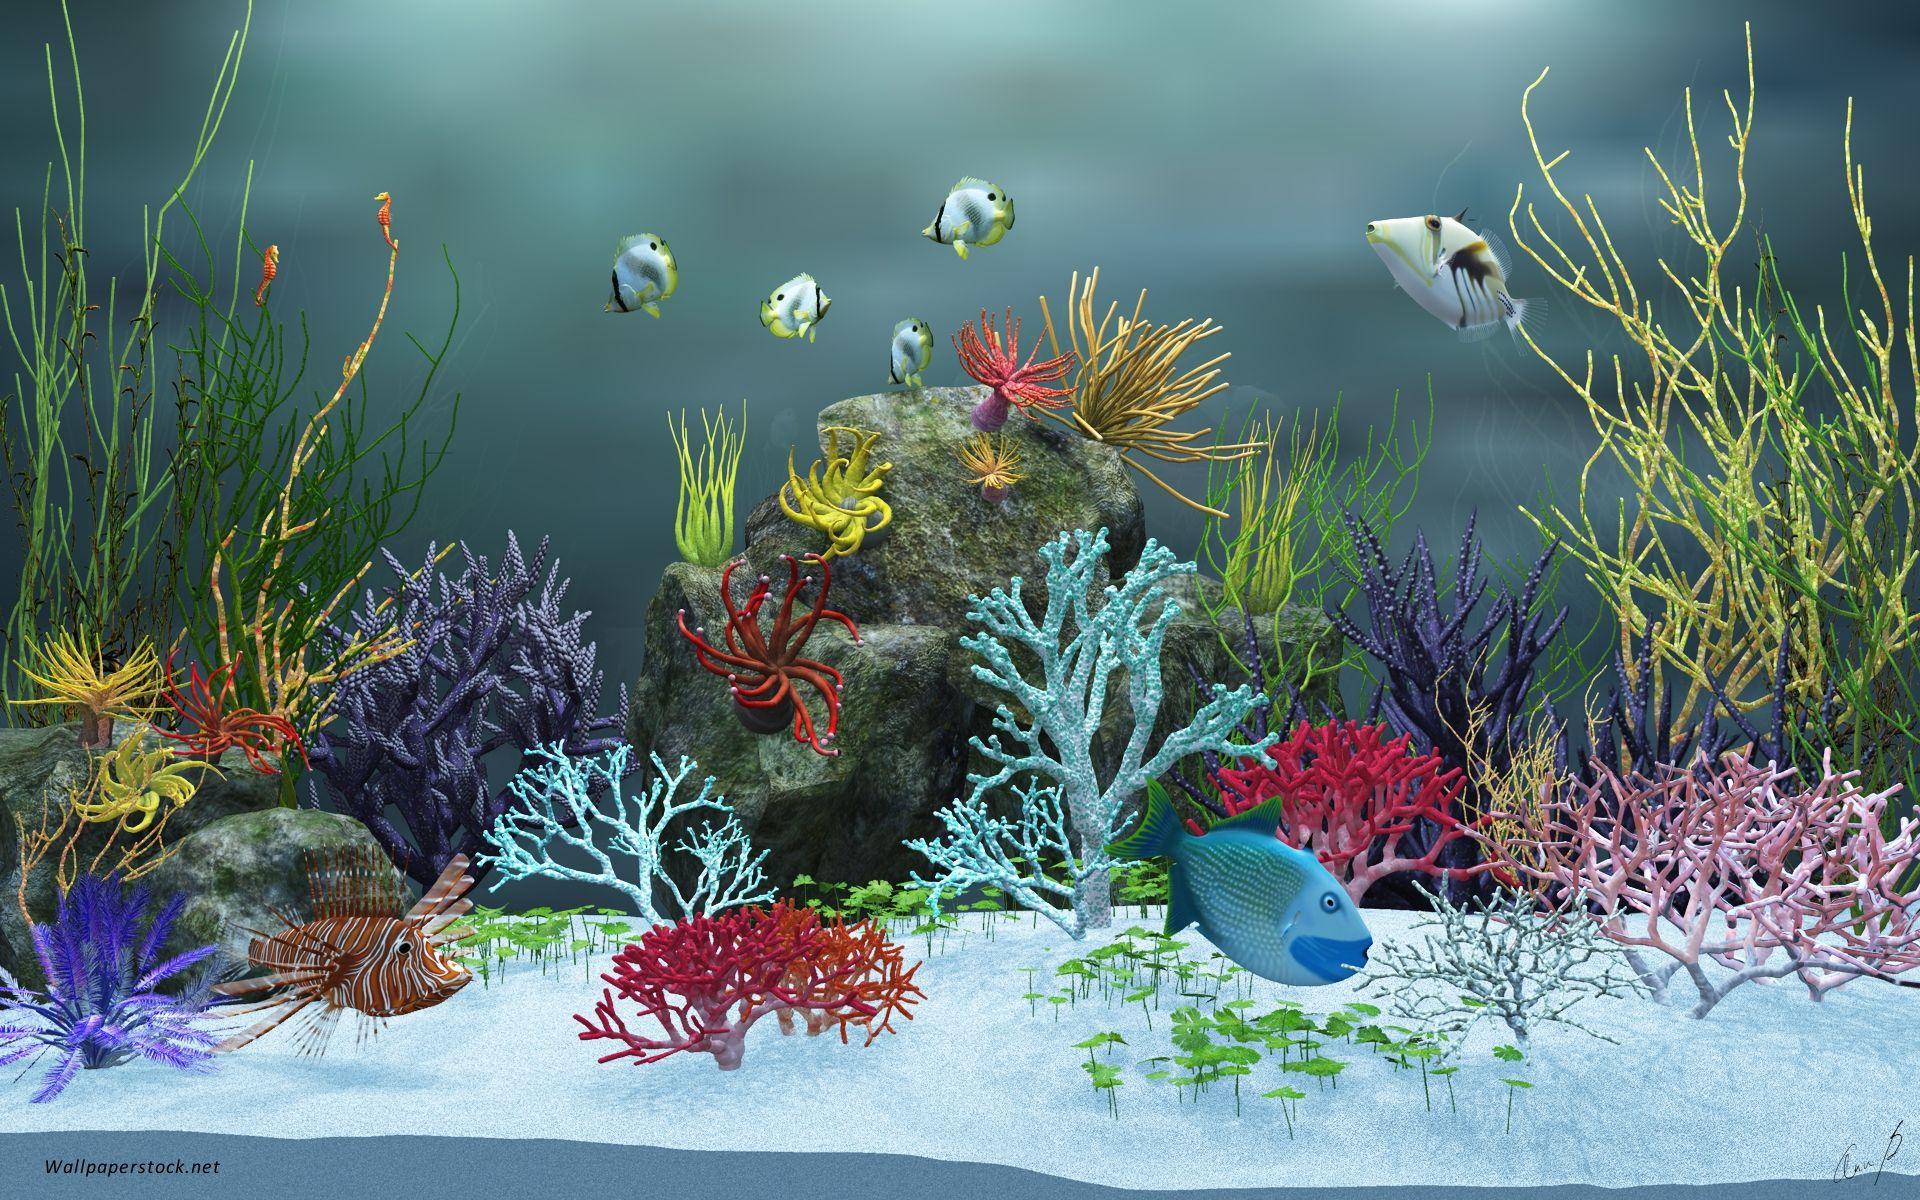 Zeovit Reef Aquarium Wallpaper for Computer by Alexander Girz